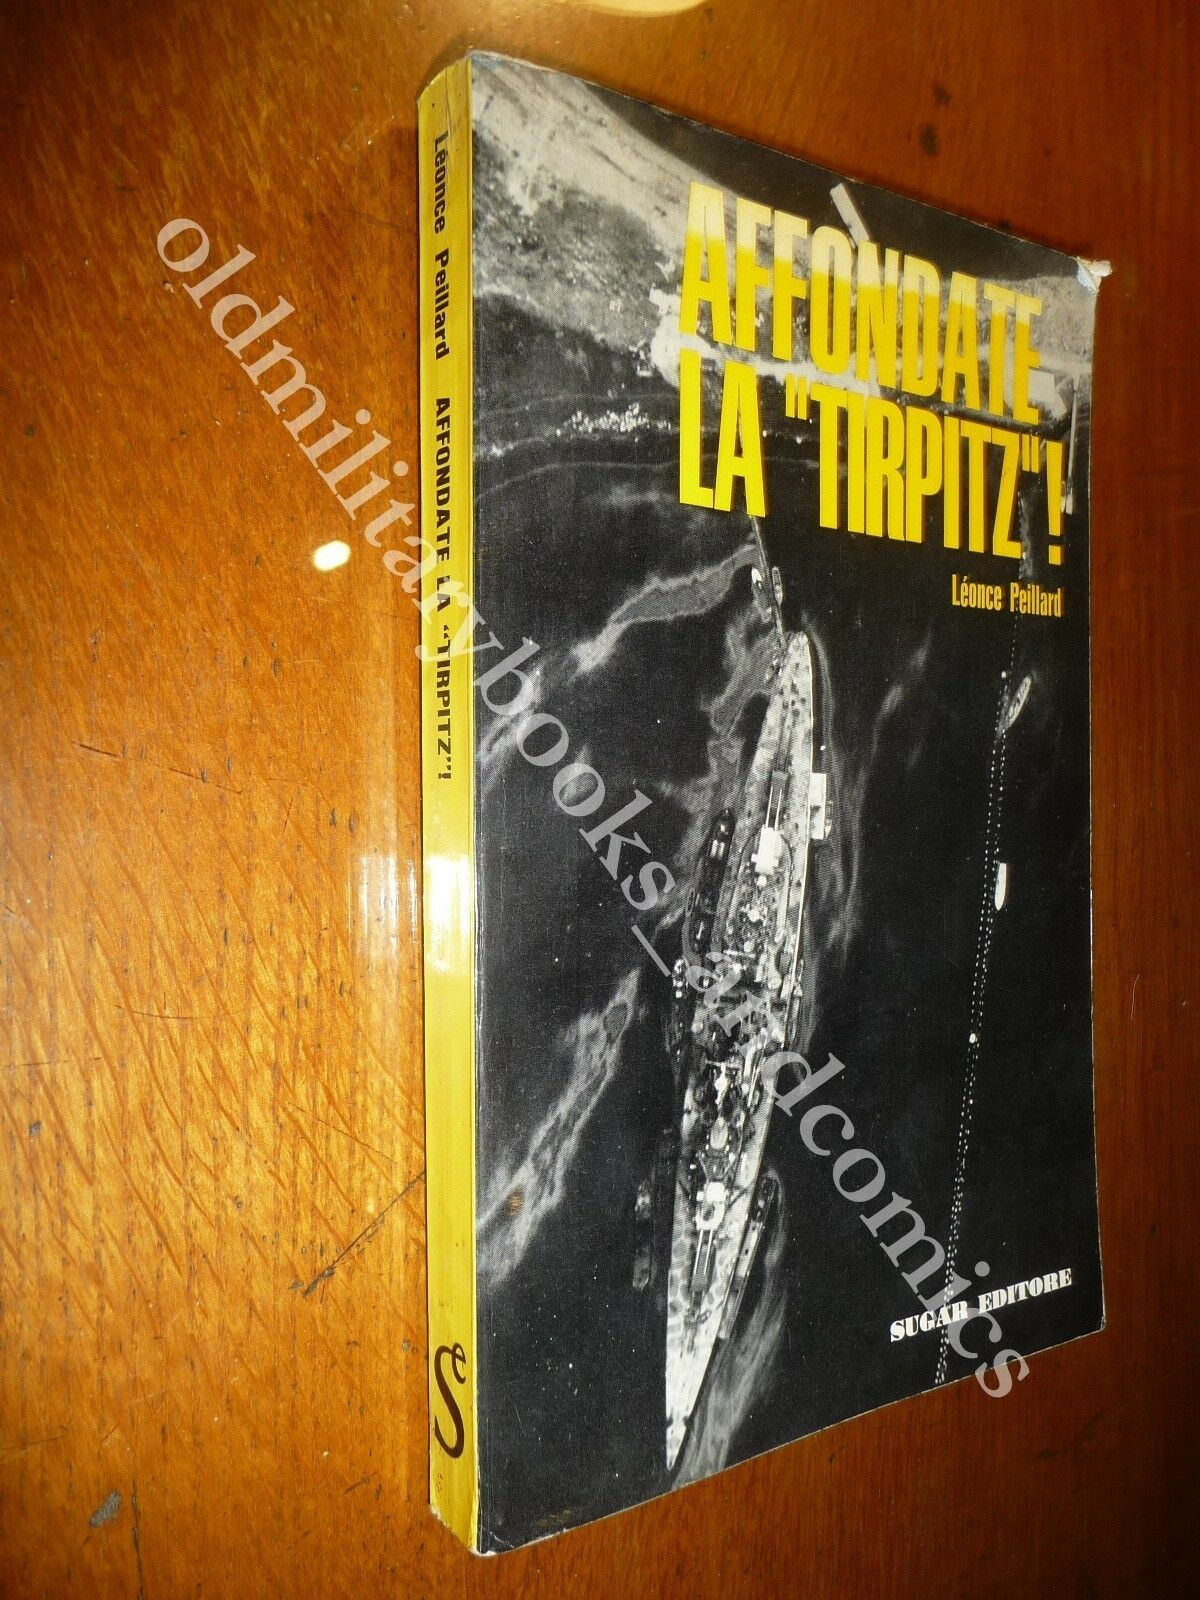 AFFONDATE LA TIRPITZ LEONCE PEILLARD I TENTATIVI INGLESI PER AFFONDARE TIRPITZ